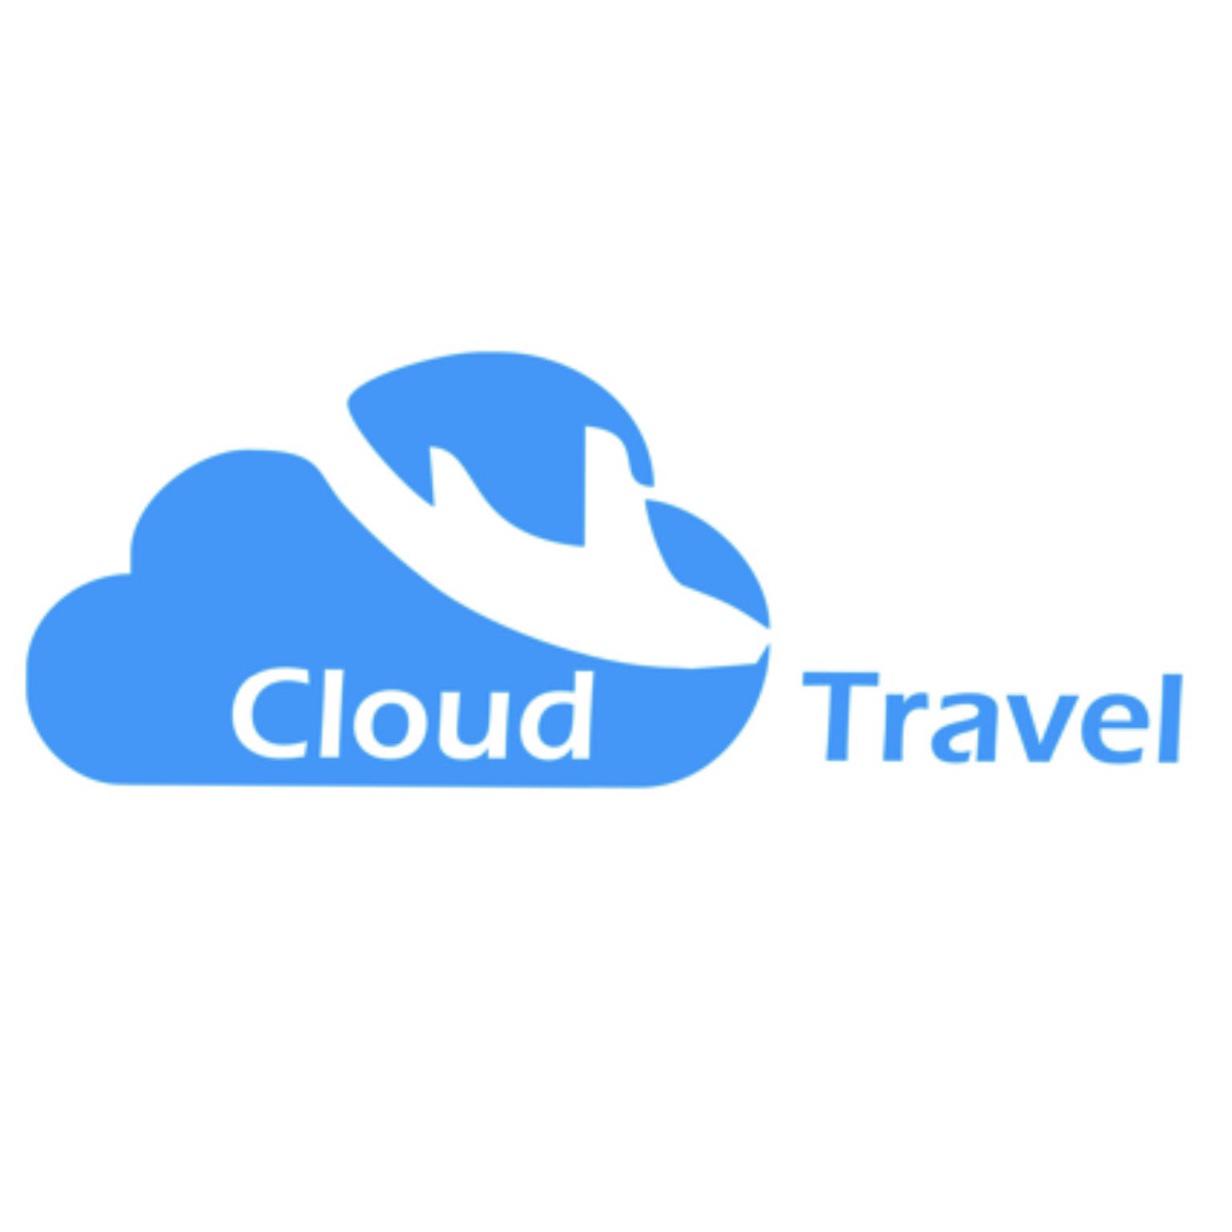 Cloud Travel